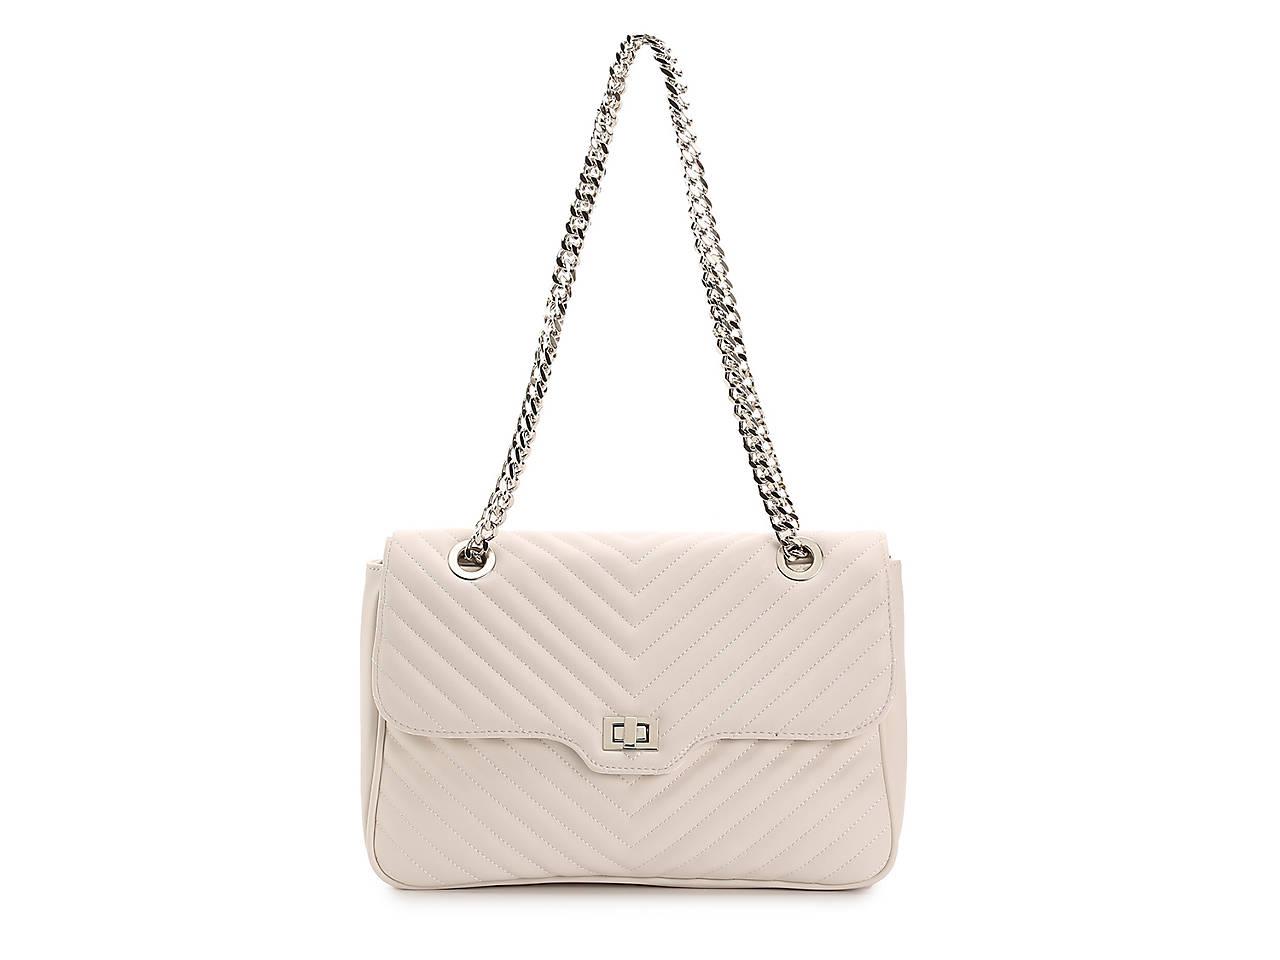 e3aee90101ff Steve Madden Bbarbie Convertible Shoulder Bag Women s Handbags ...